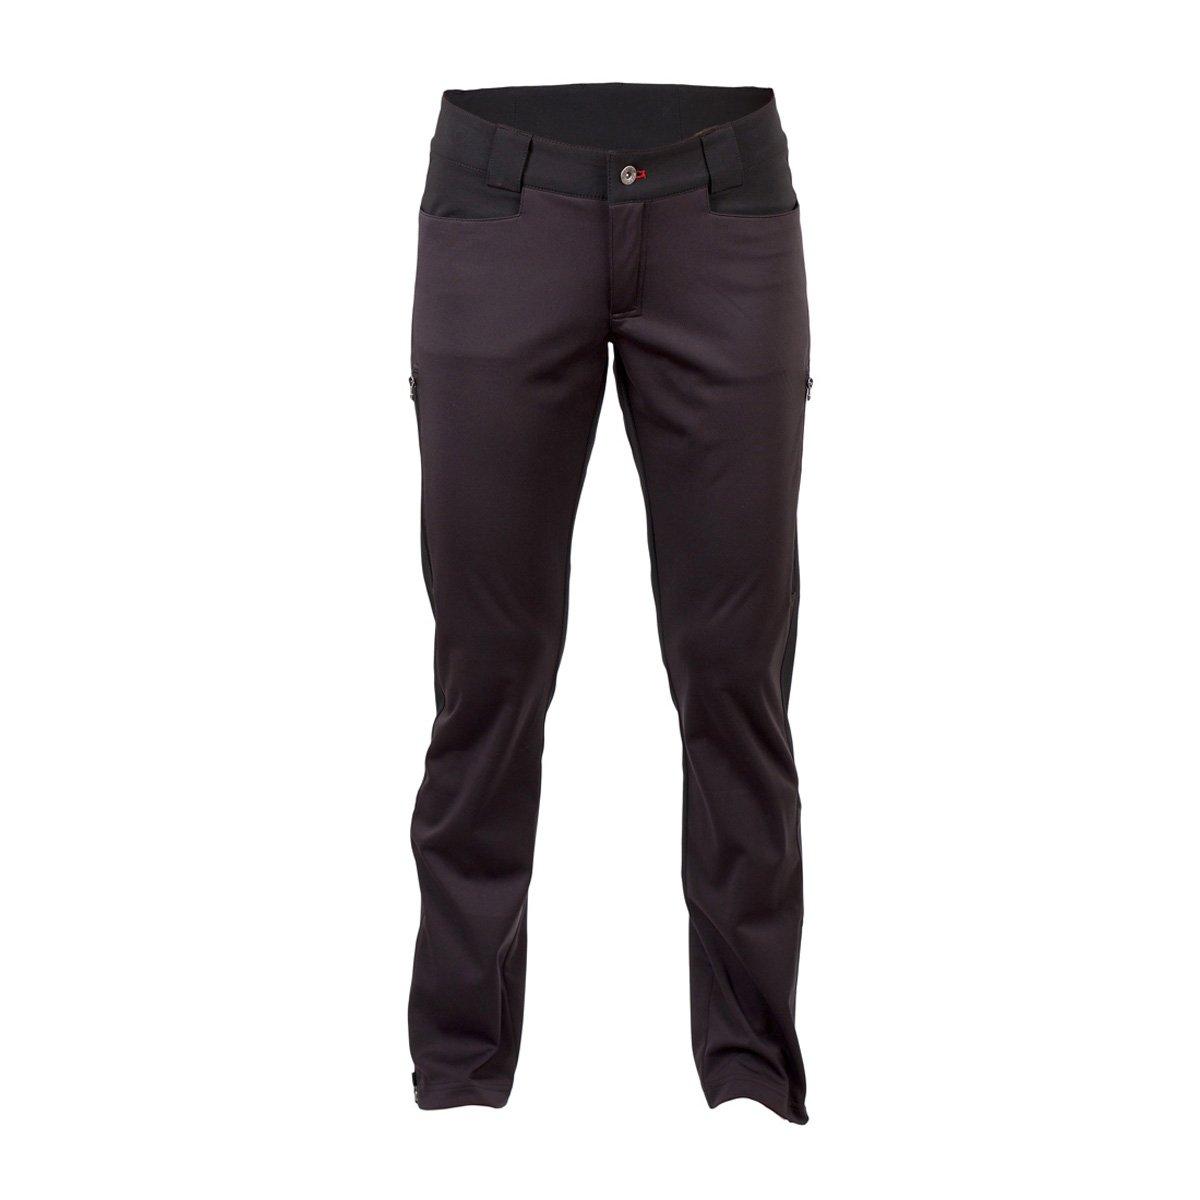 Club Ride Apparel Women's Imogen Weather Resistant Cycling Pants WPIM601